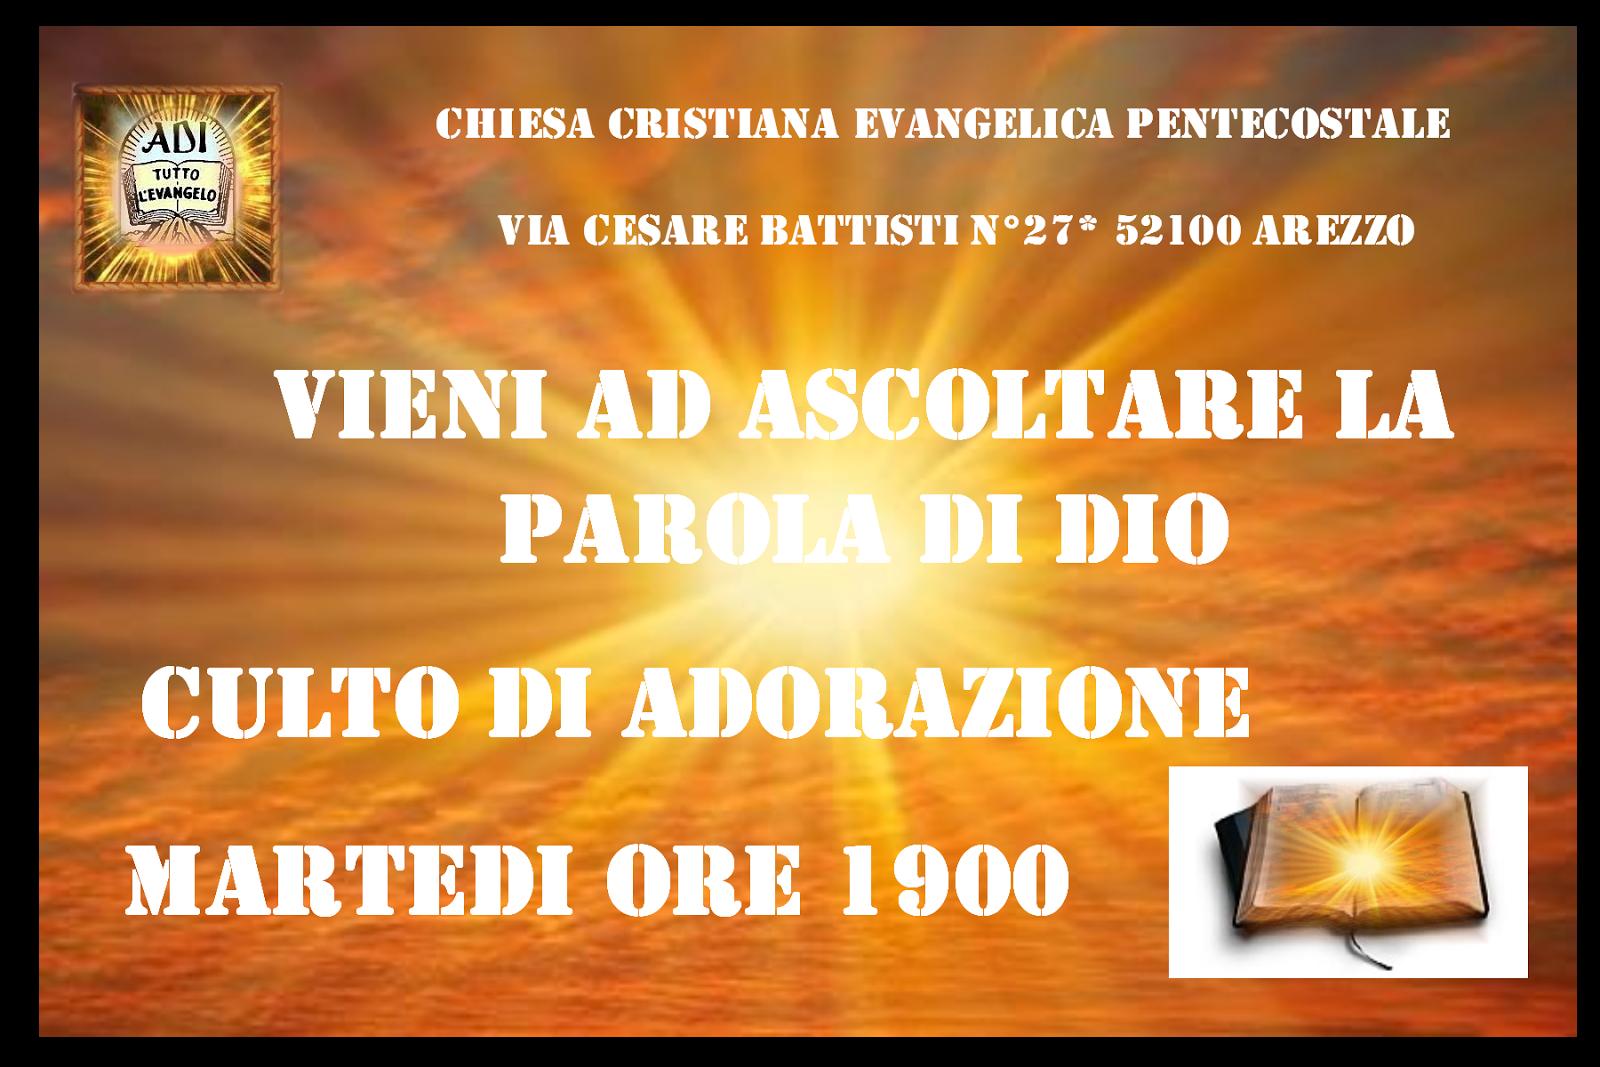 Estremamente Frasi Cristiane Evangeliche TX33